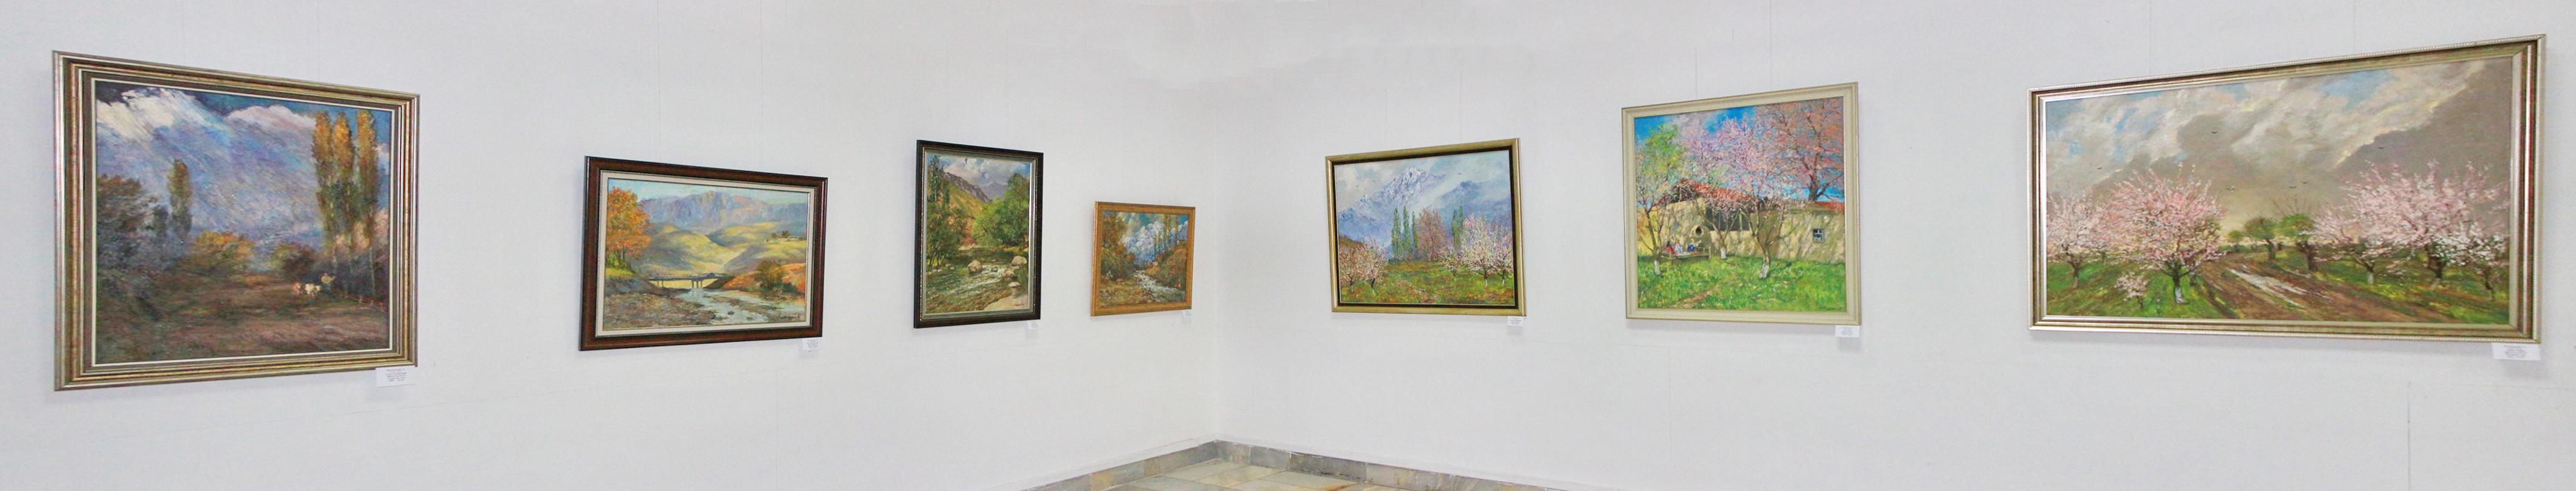 Мирзахмедов Хаким. Экспозиция картин. 2020